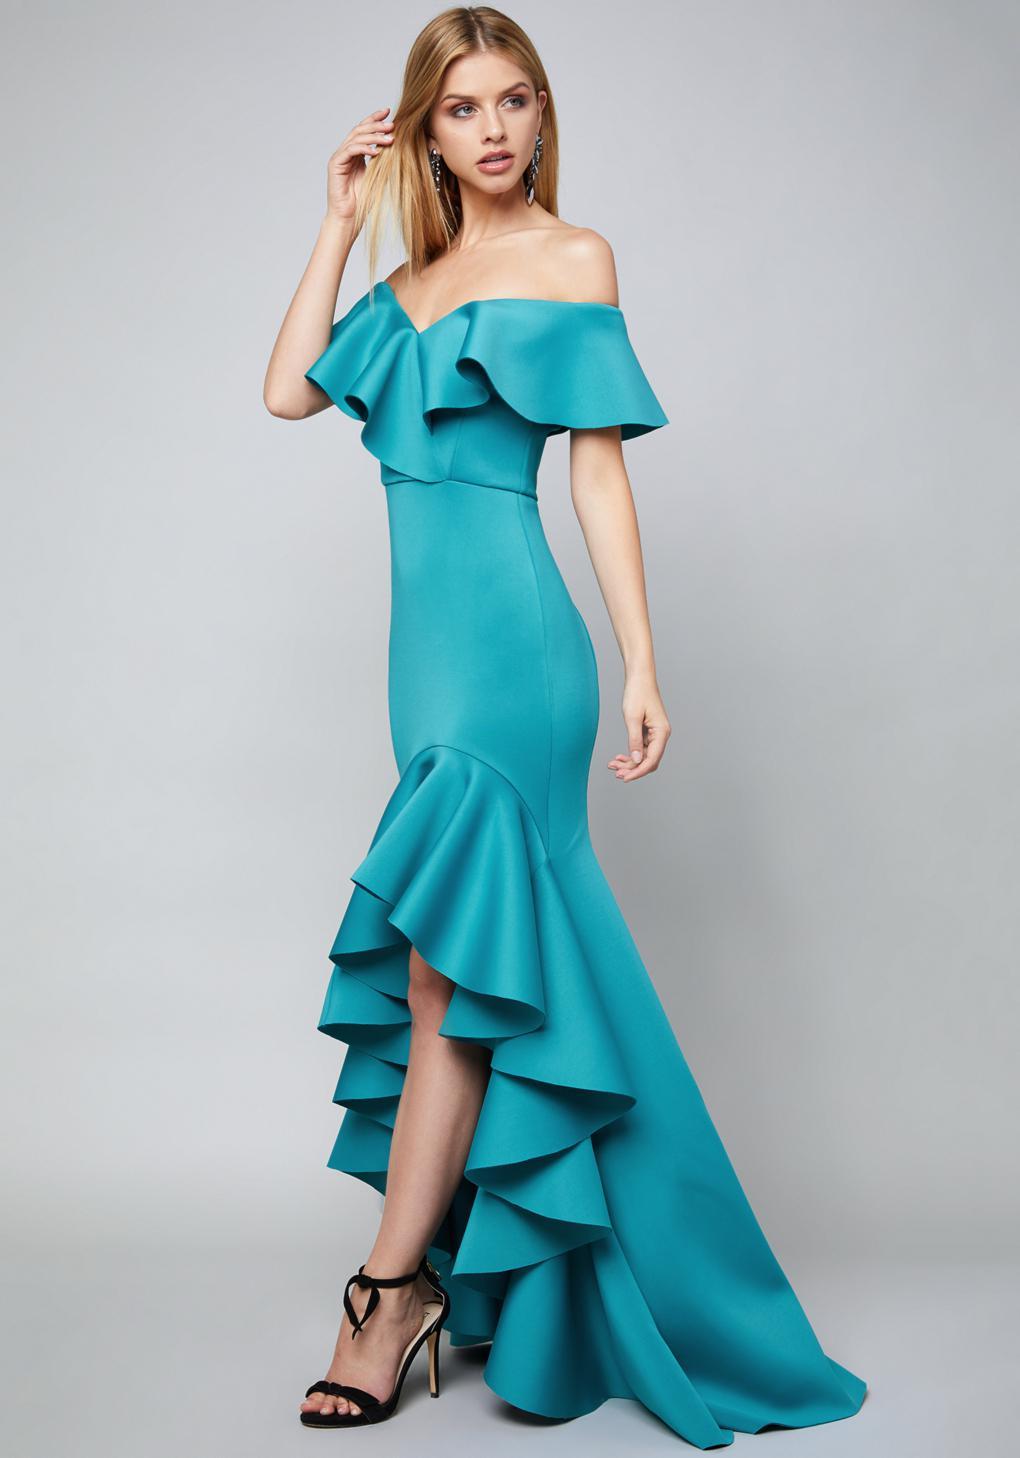 Lyst - Bebe Mae Ruffled Hi-lo Gown in Blue